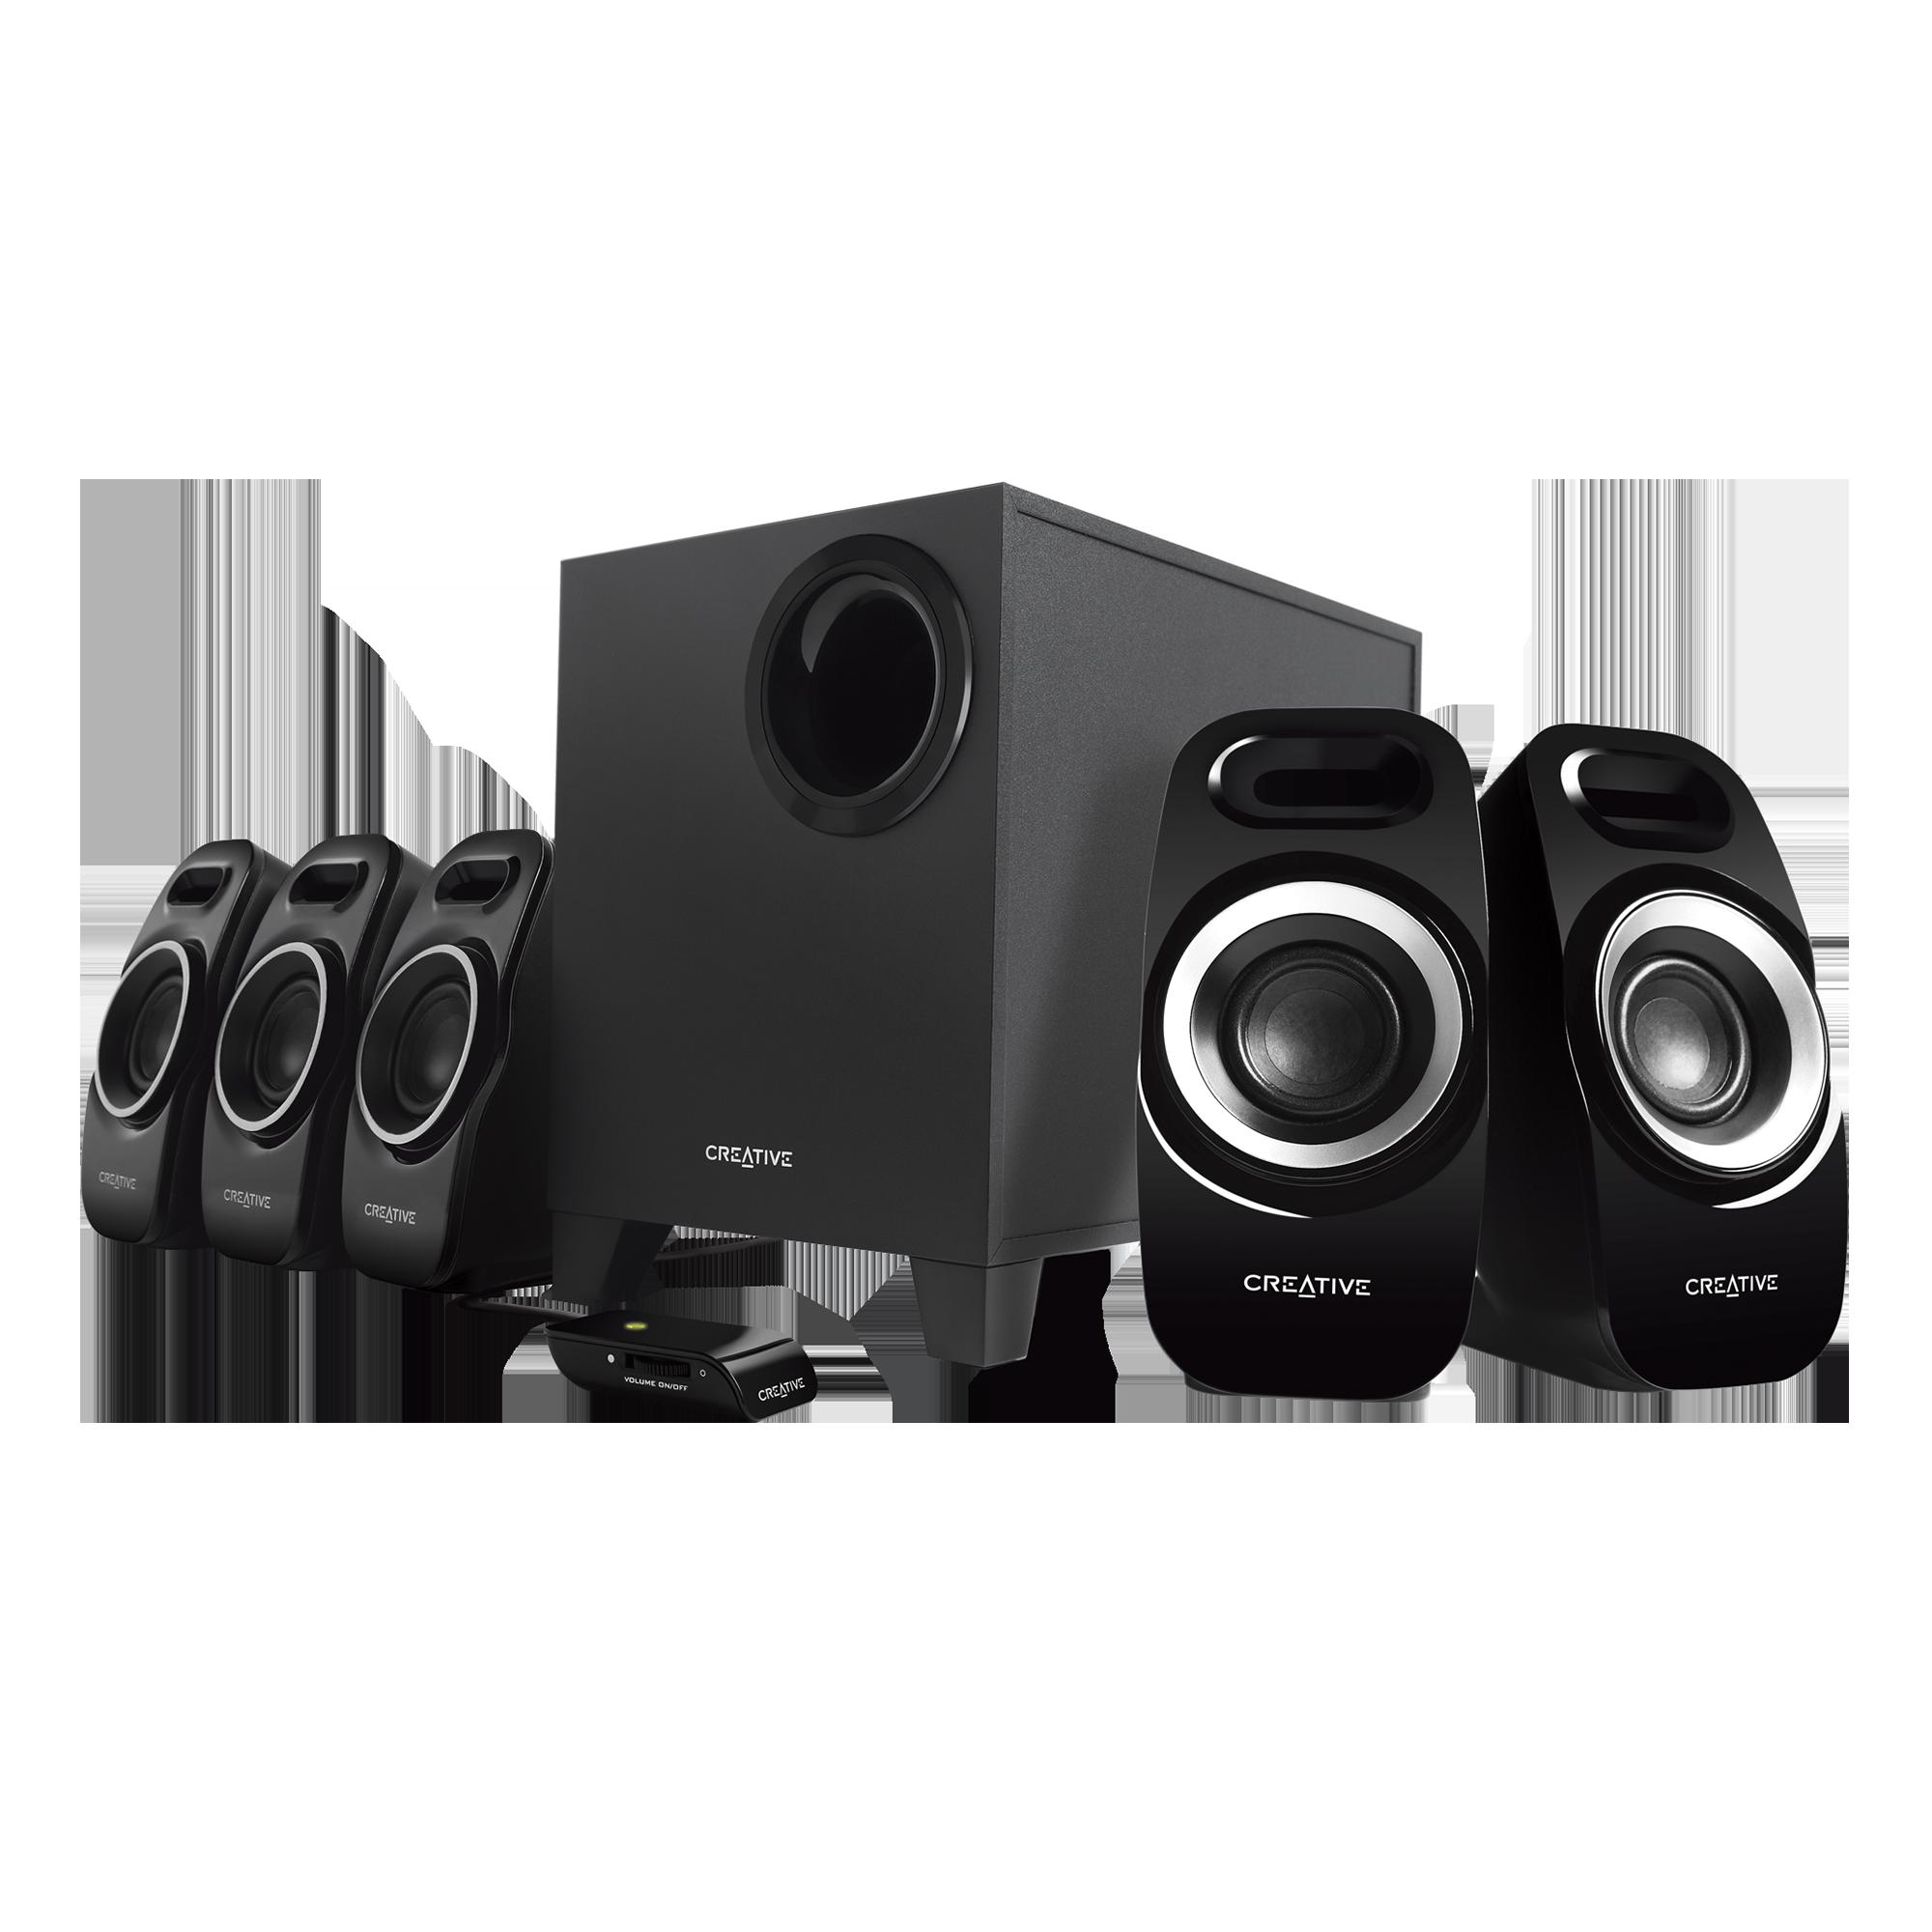 creative-inspire-t6300-plug